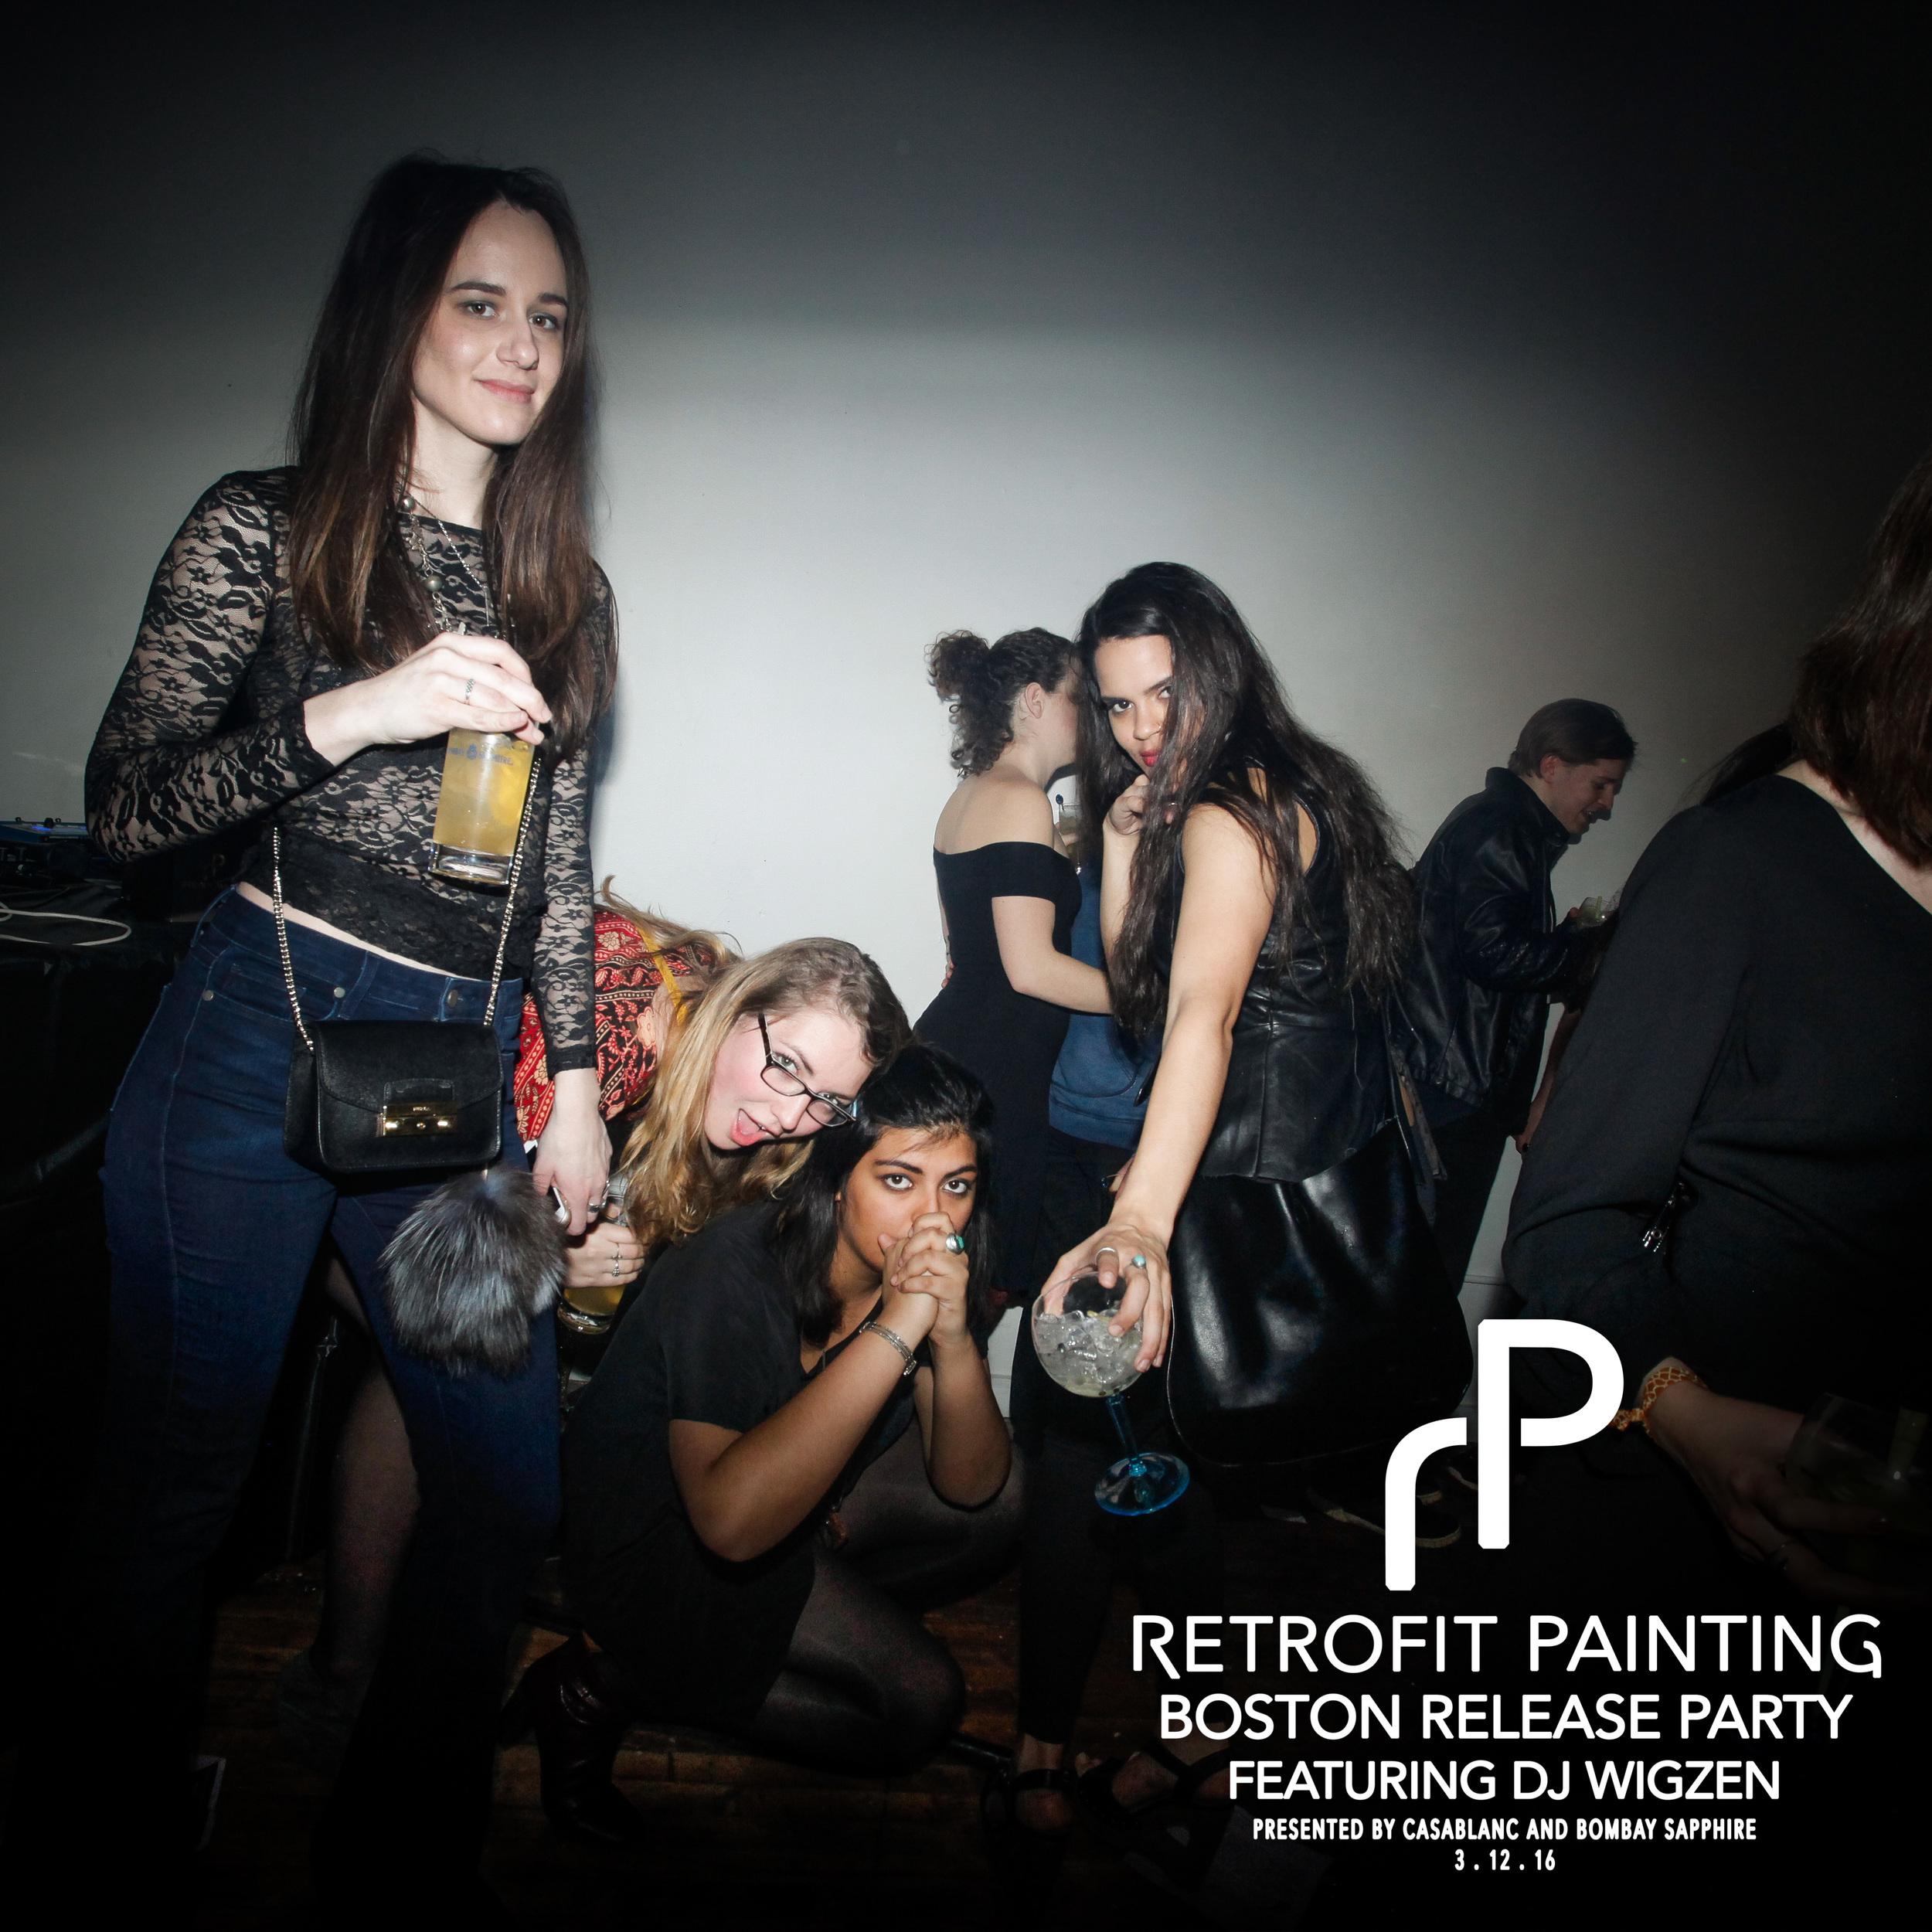 Retrofit Painting Boston Release Party 0144.jpg